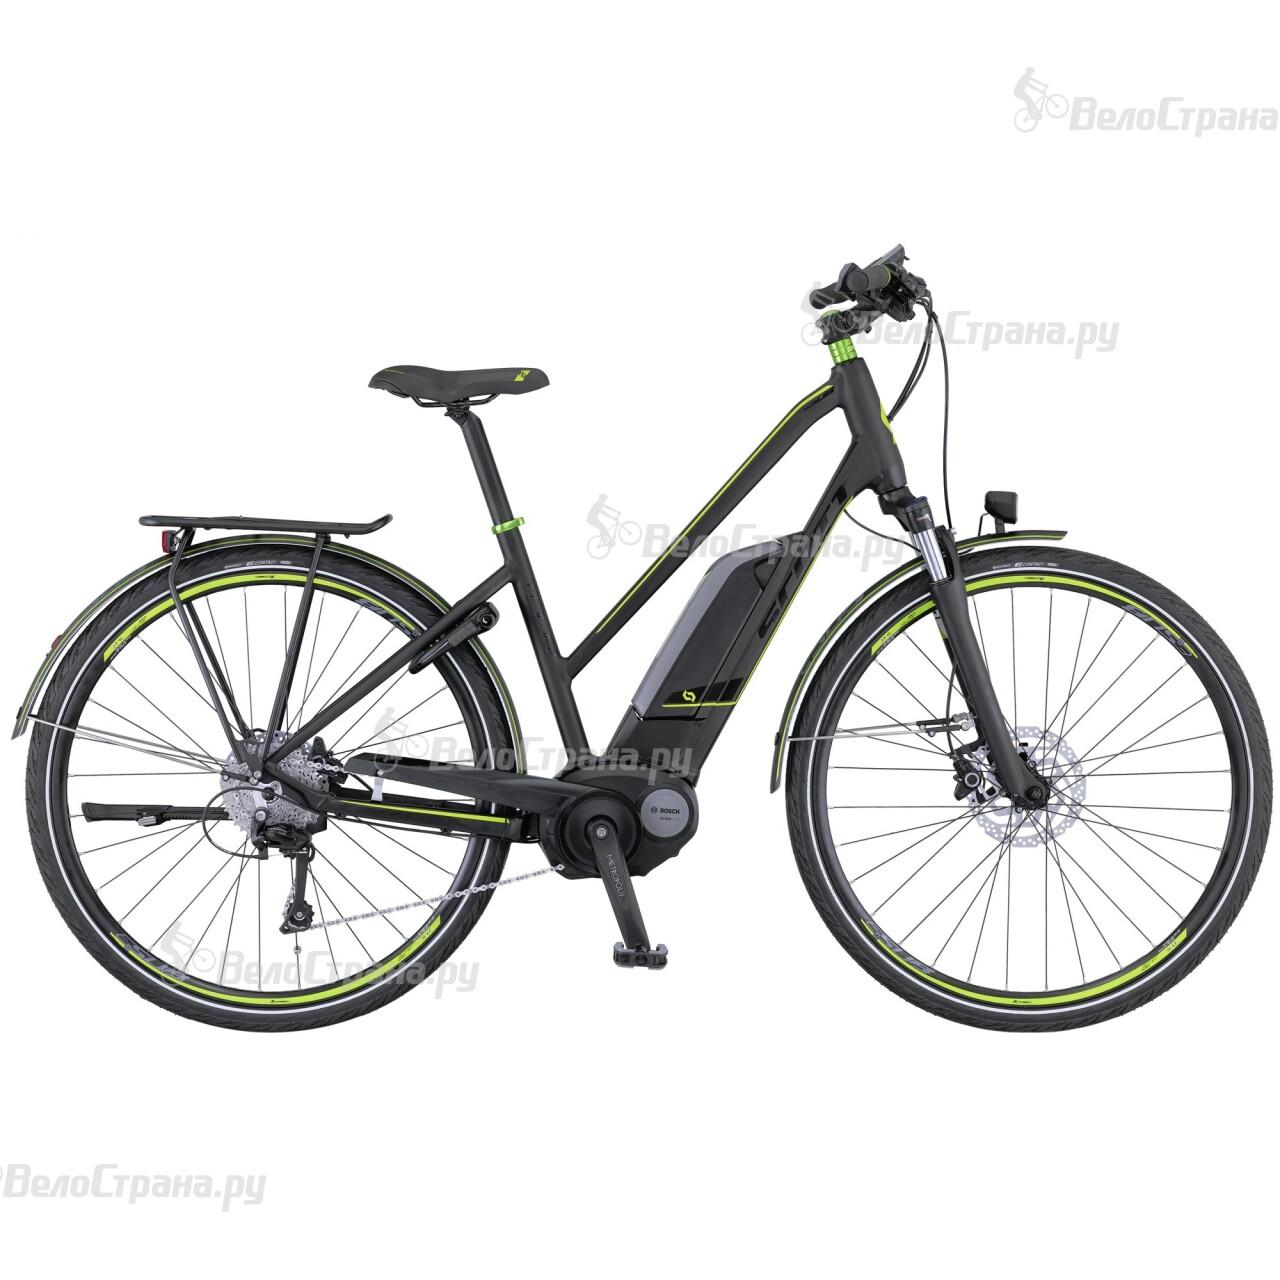 Велосипед Scott E-Sub Tour Lady (2016) scott w scott rob roy